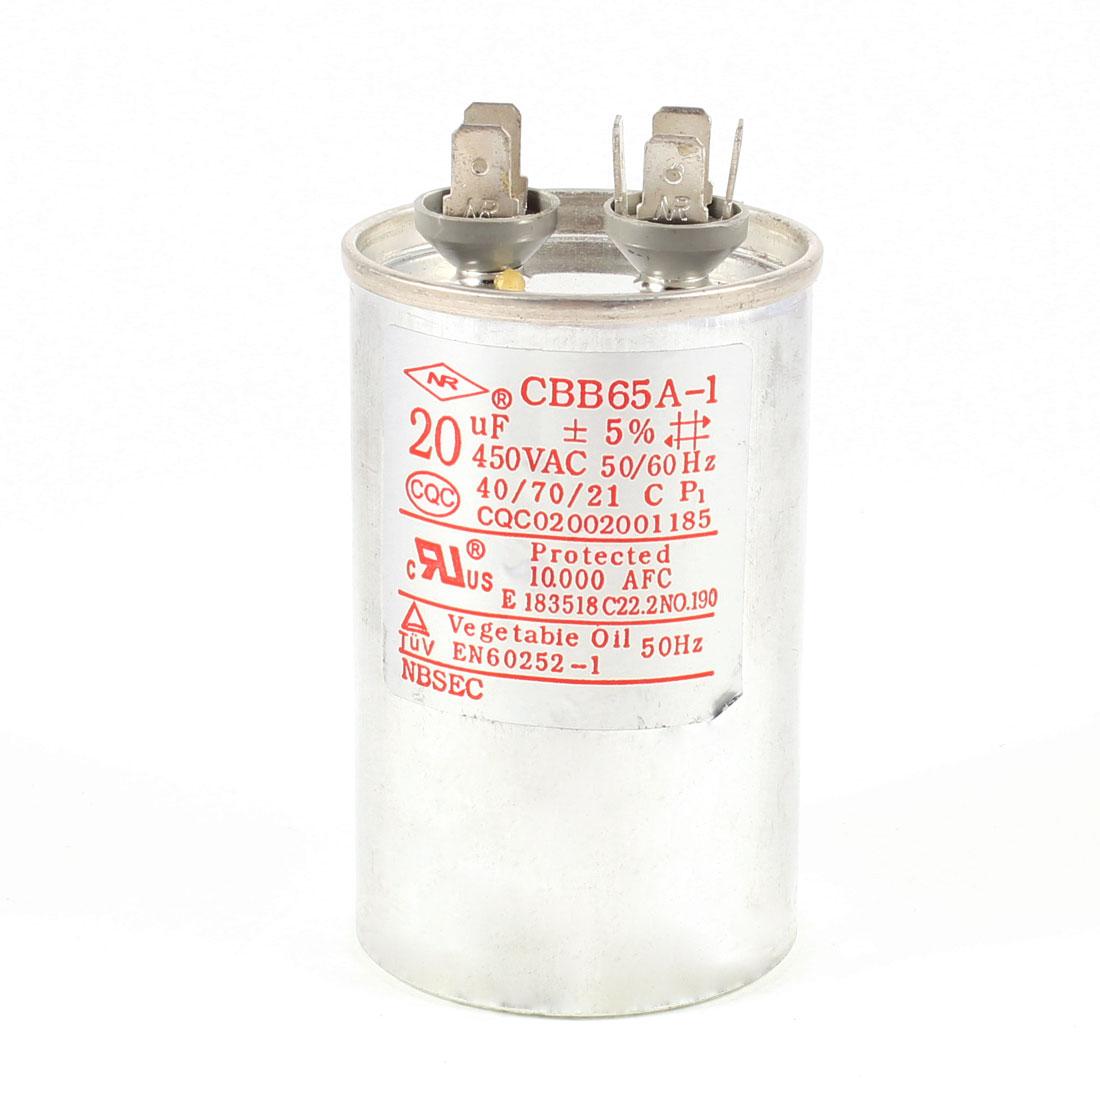 CBB65A-1 Air Conditioner Polypropylene Film Motor Run Capacitor 5% 20uF 450V